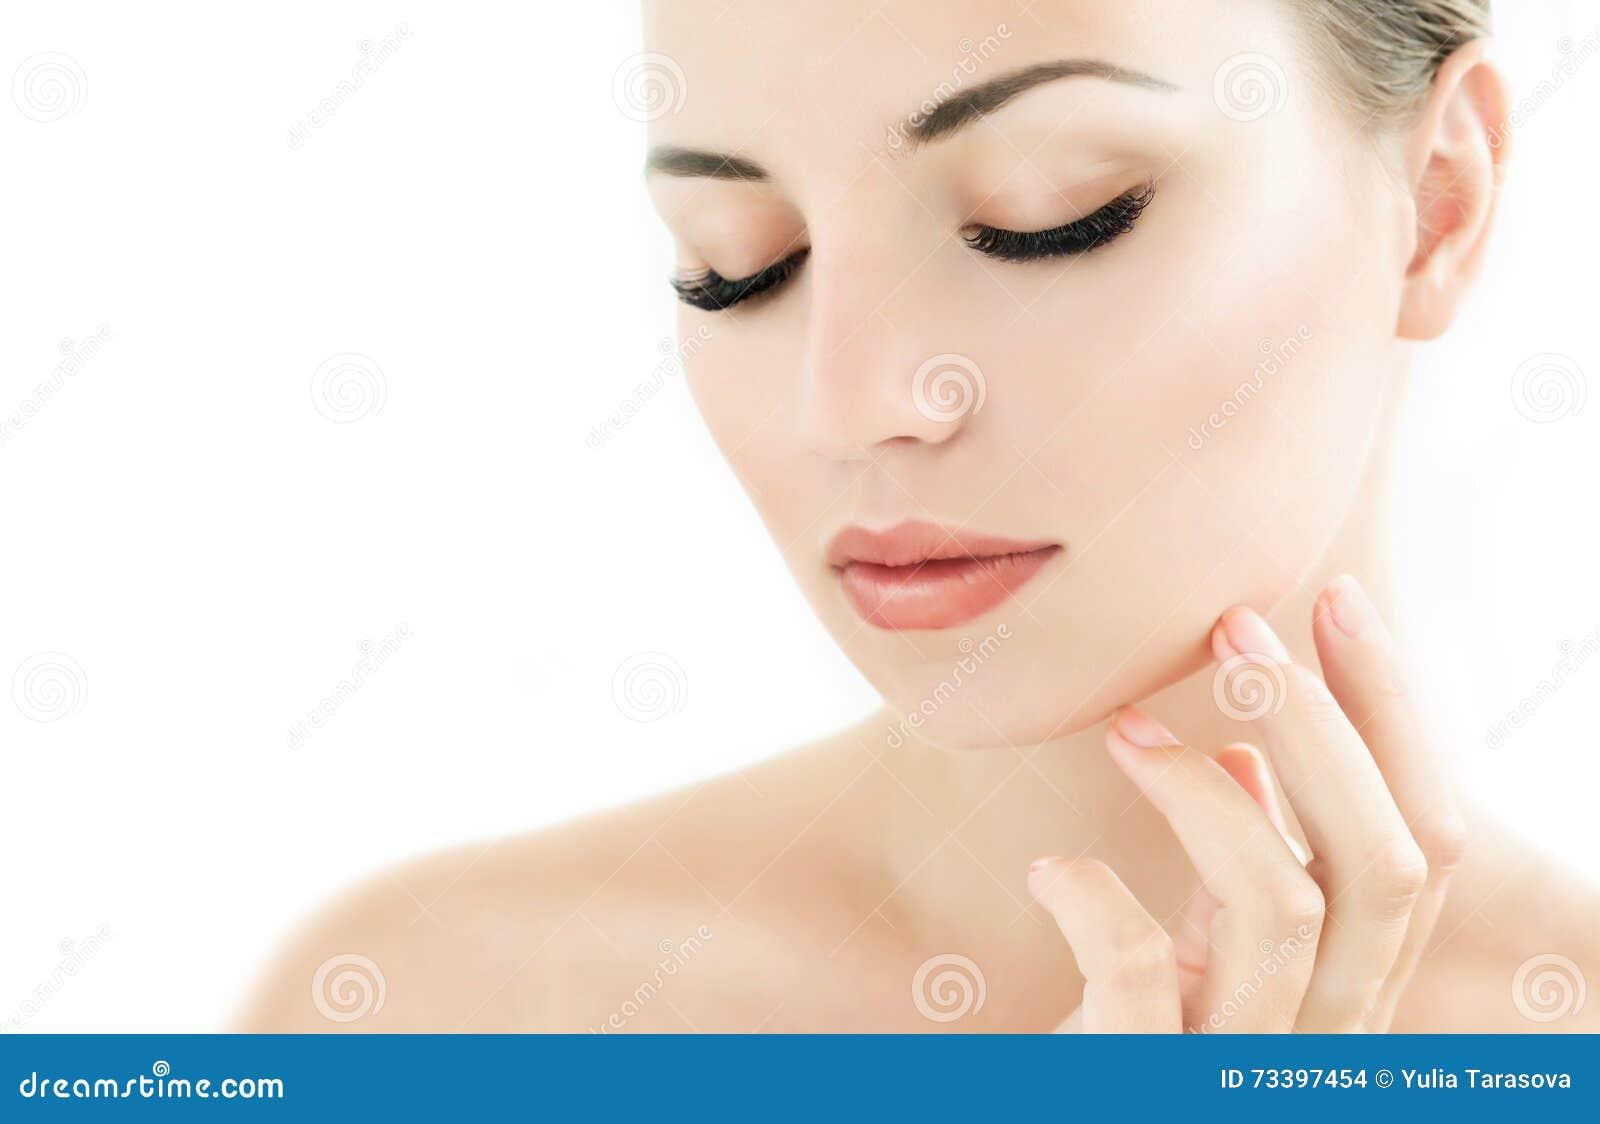 Beauty Model With Perfect Fresh Skin And Long Eyelashes Stock Photo